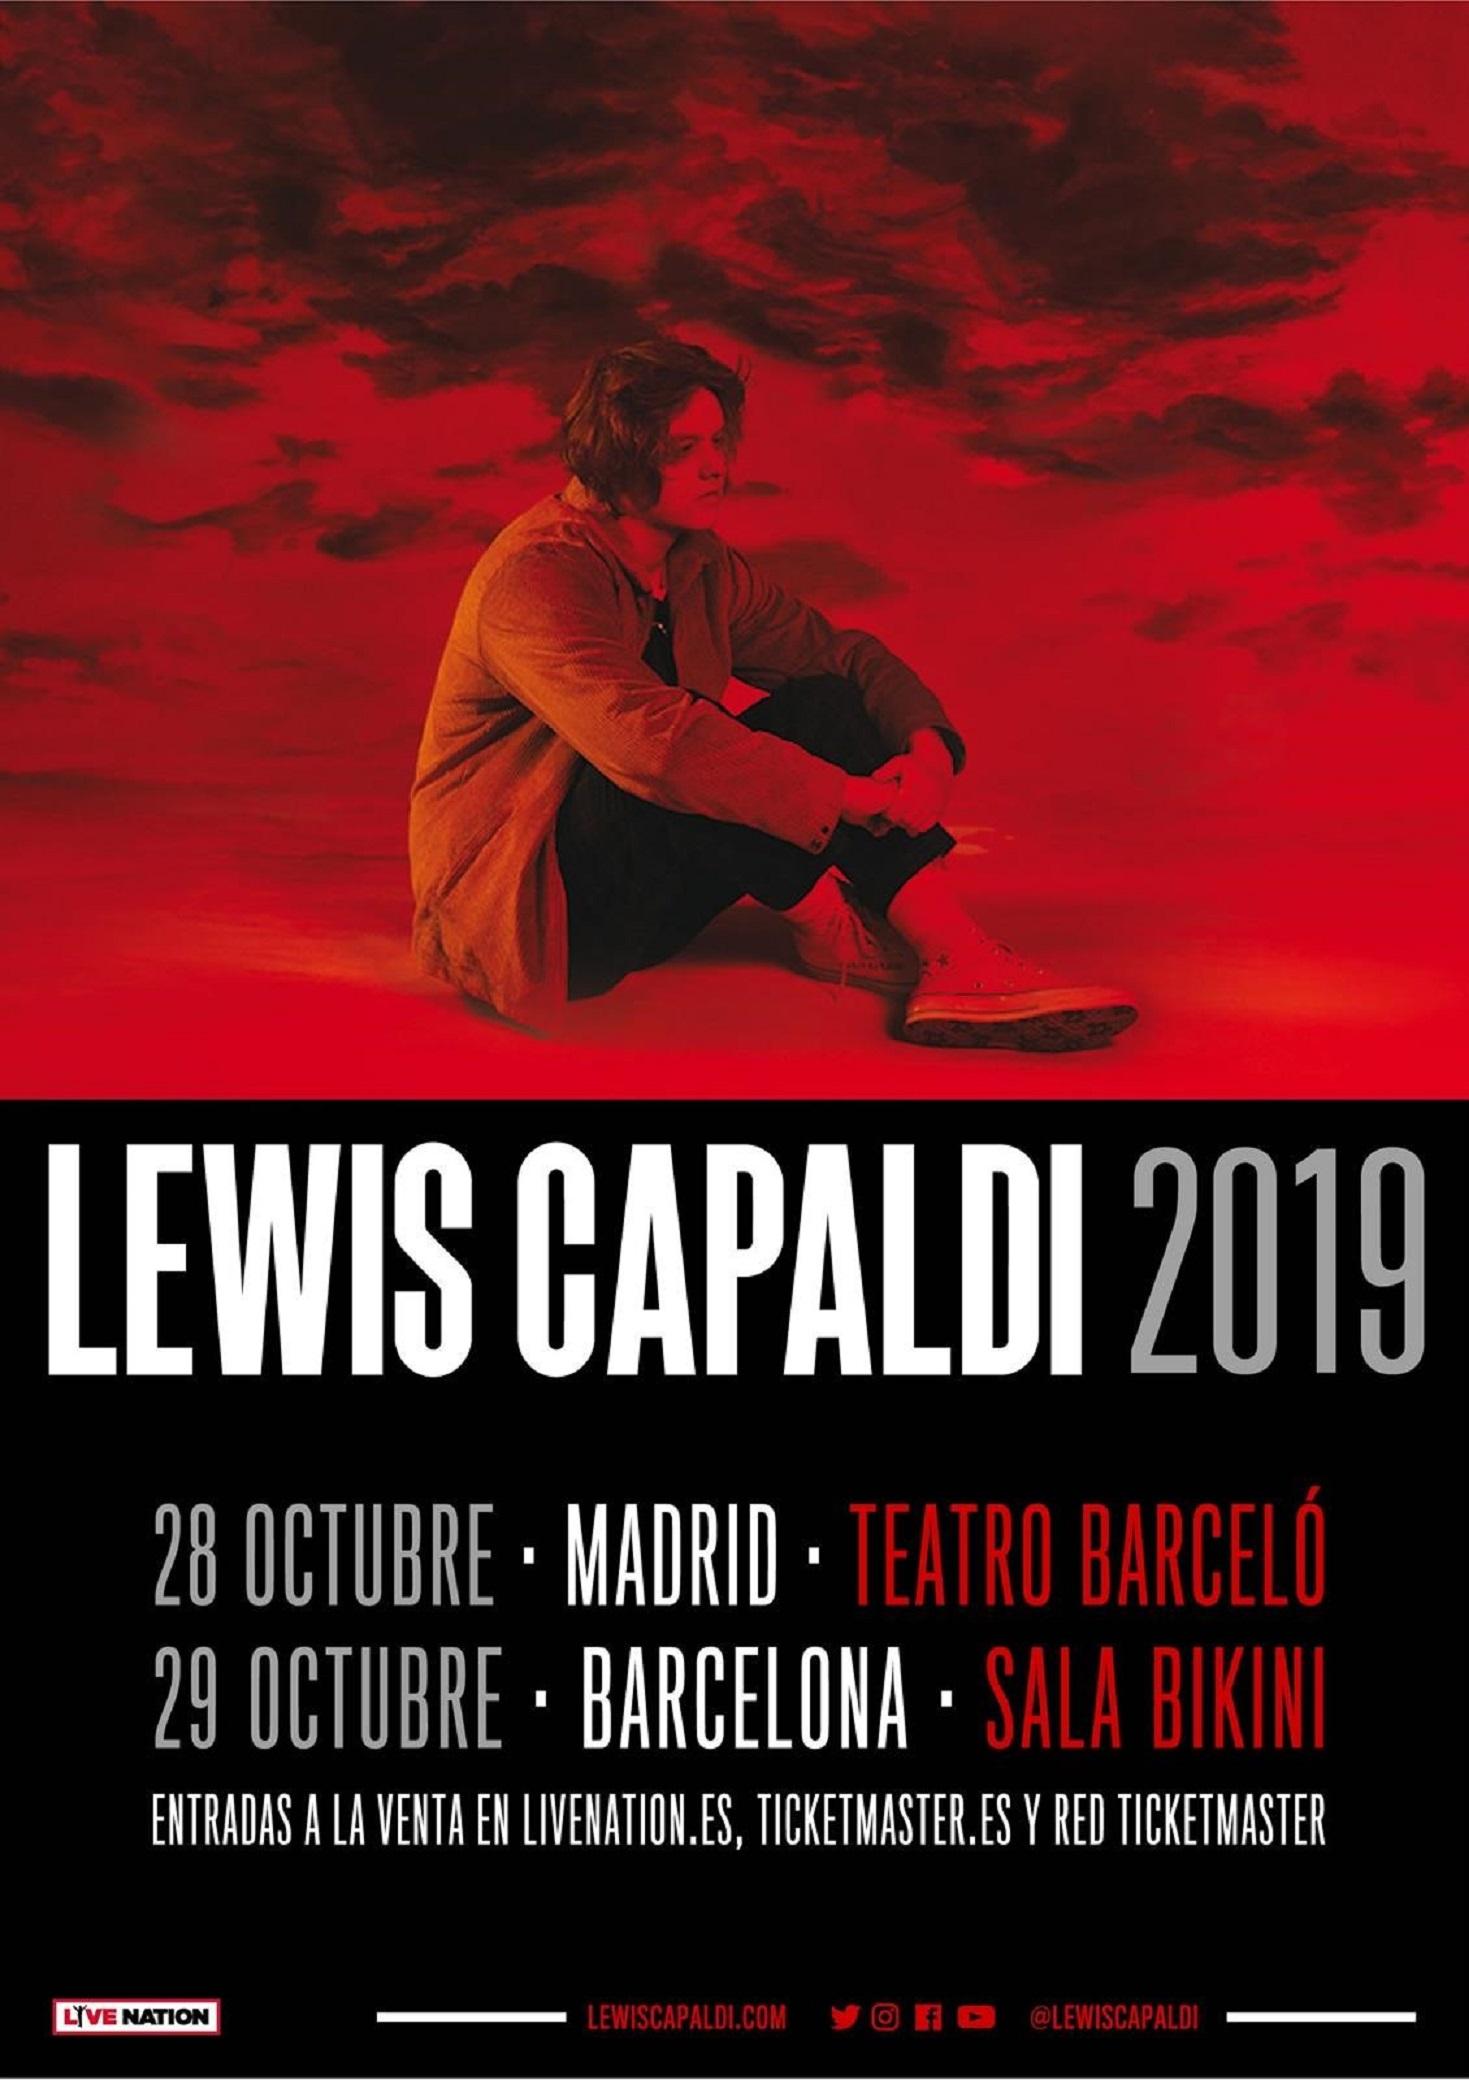 Lewis Capaldi Lewis Lewis Capaldi Lewis Lewis Capaldi Capaldi Capaldi Lewis Capaldi Lewis 4ARq35SjcL